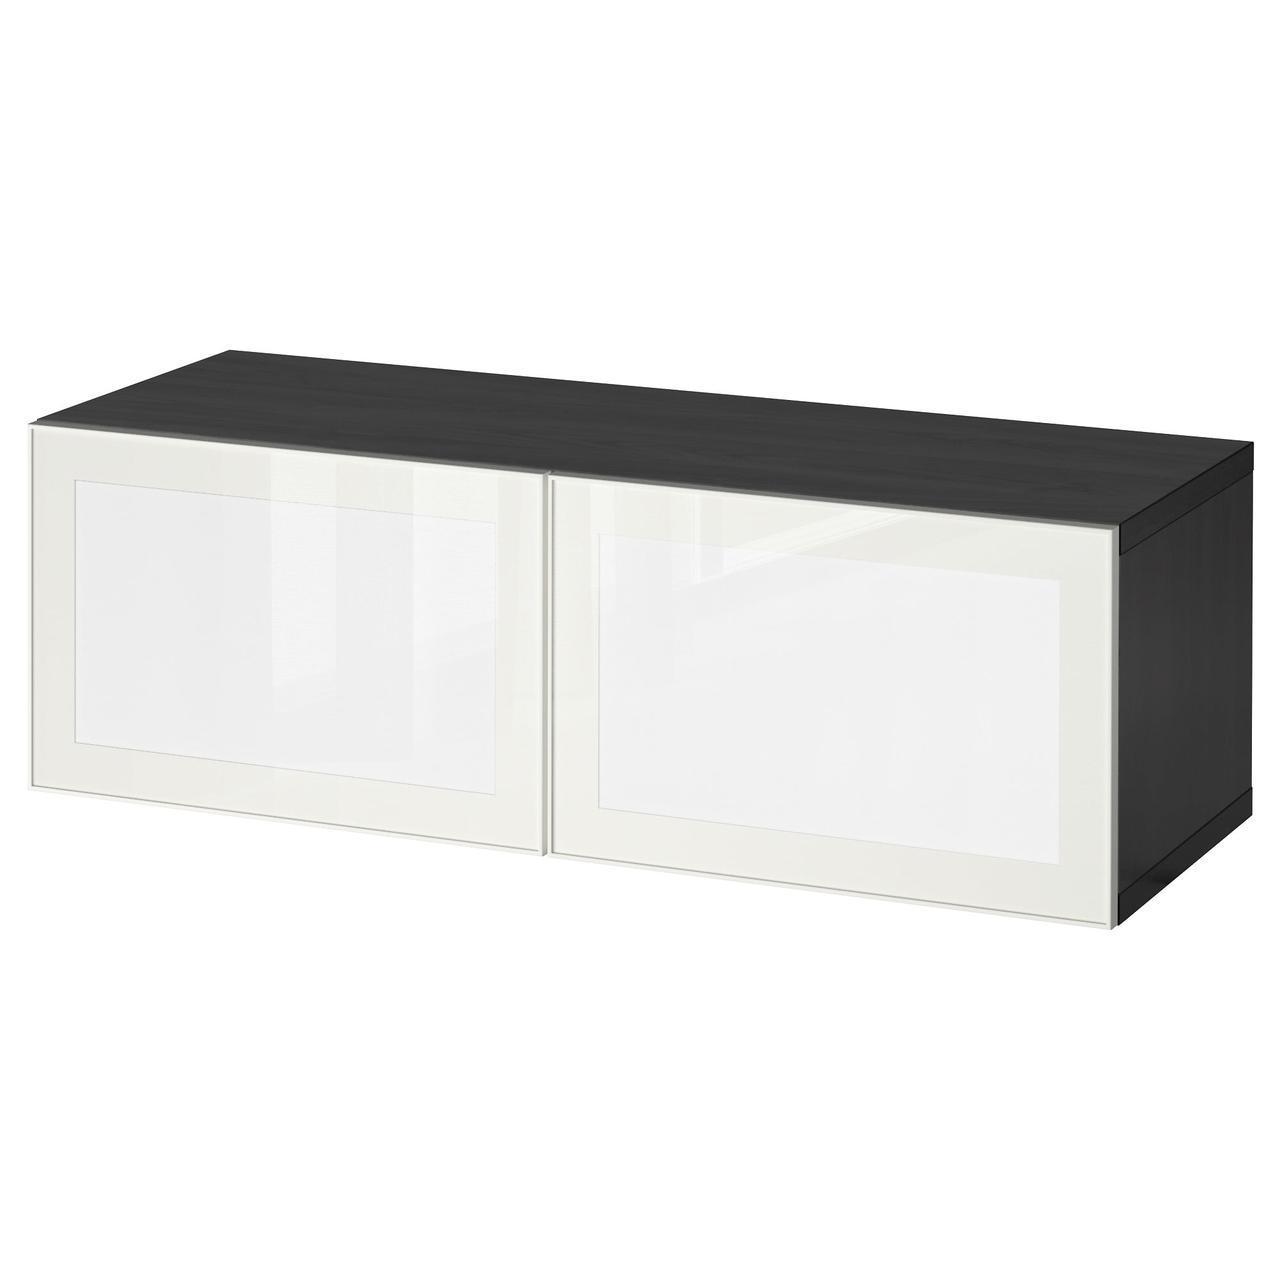 IKEA BESTA / SURTE (391.931.49) Шкаф со светодиодной дверью, белый, белый